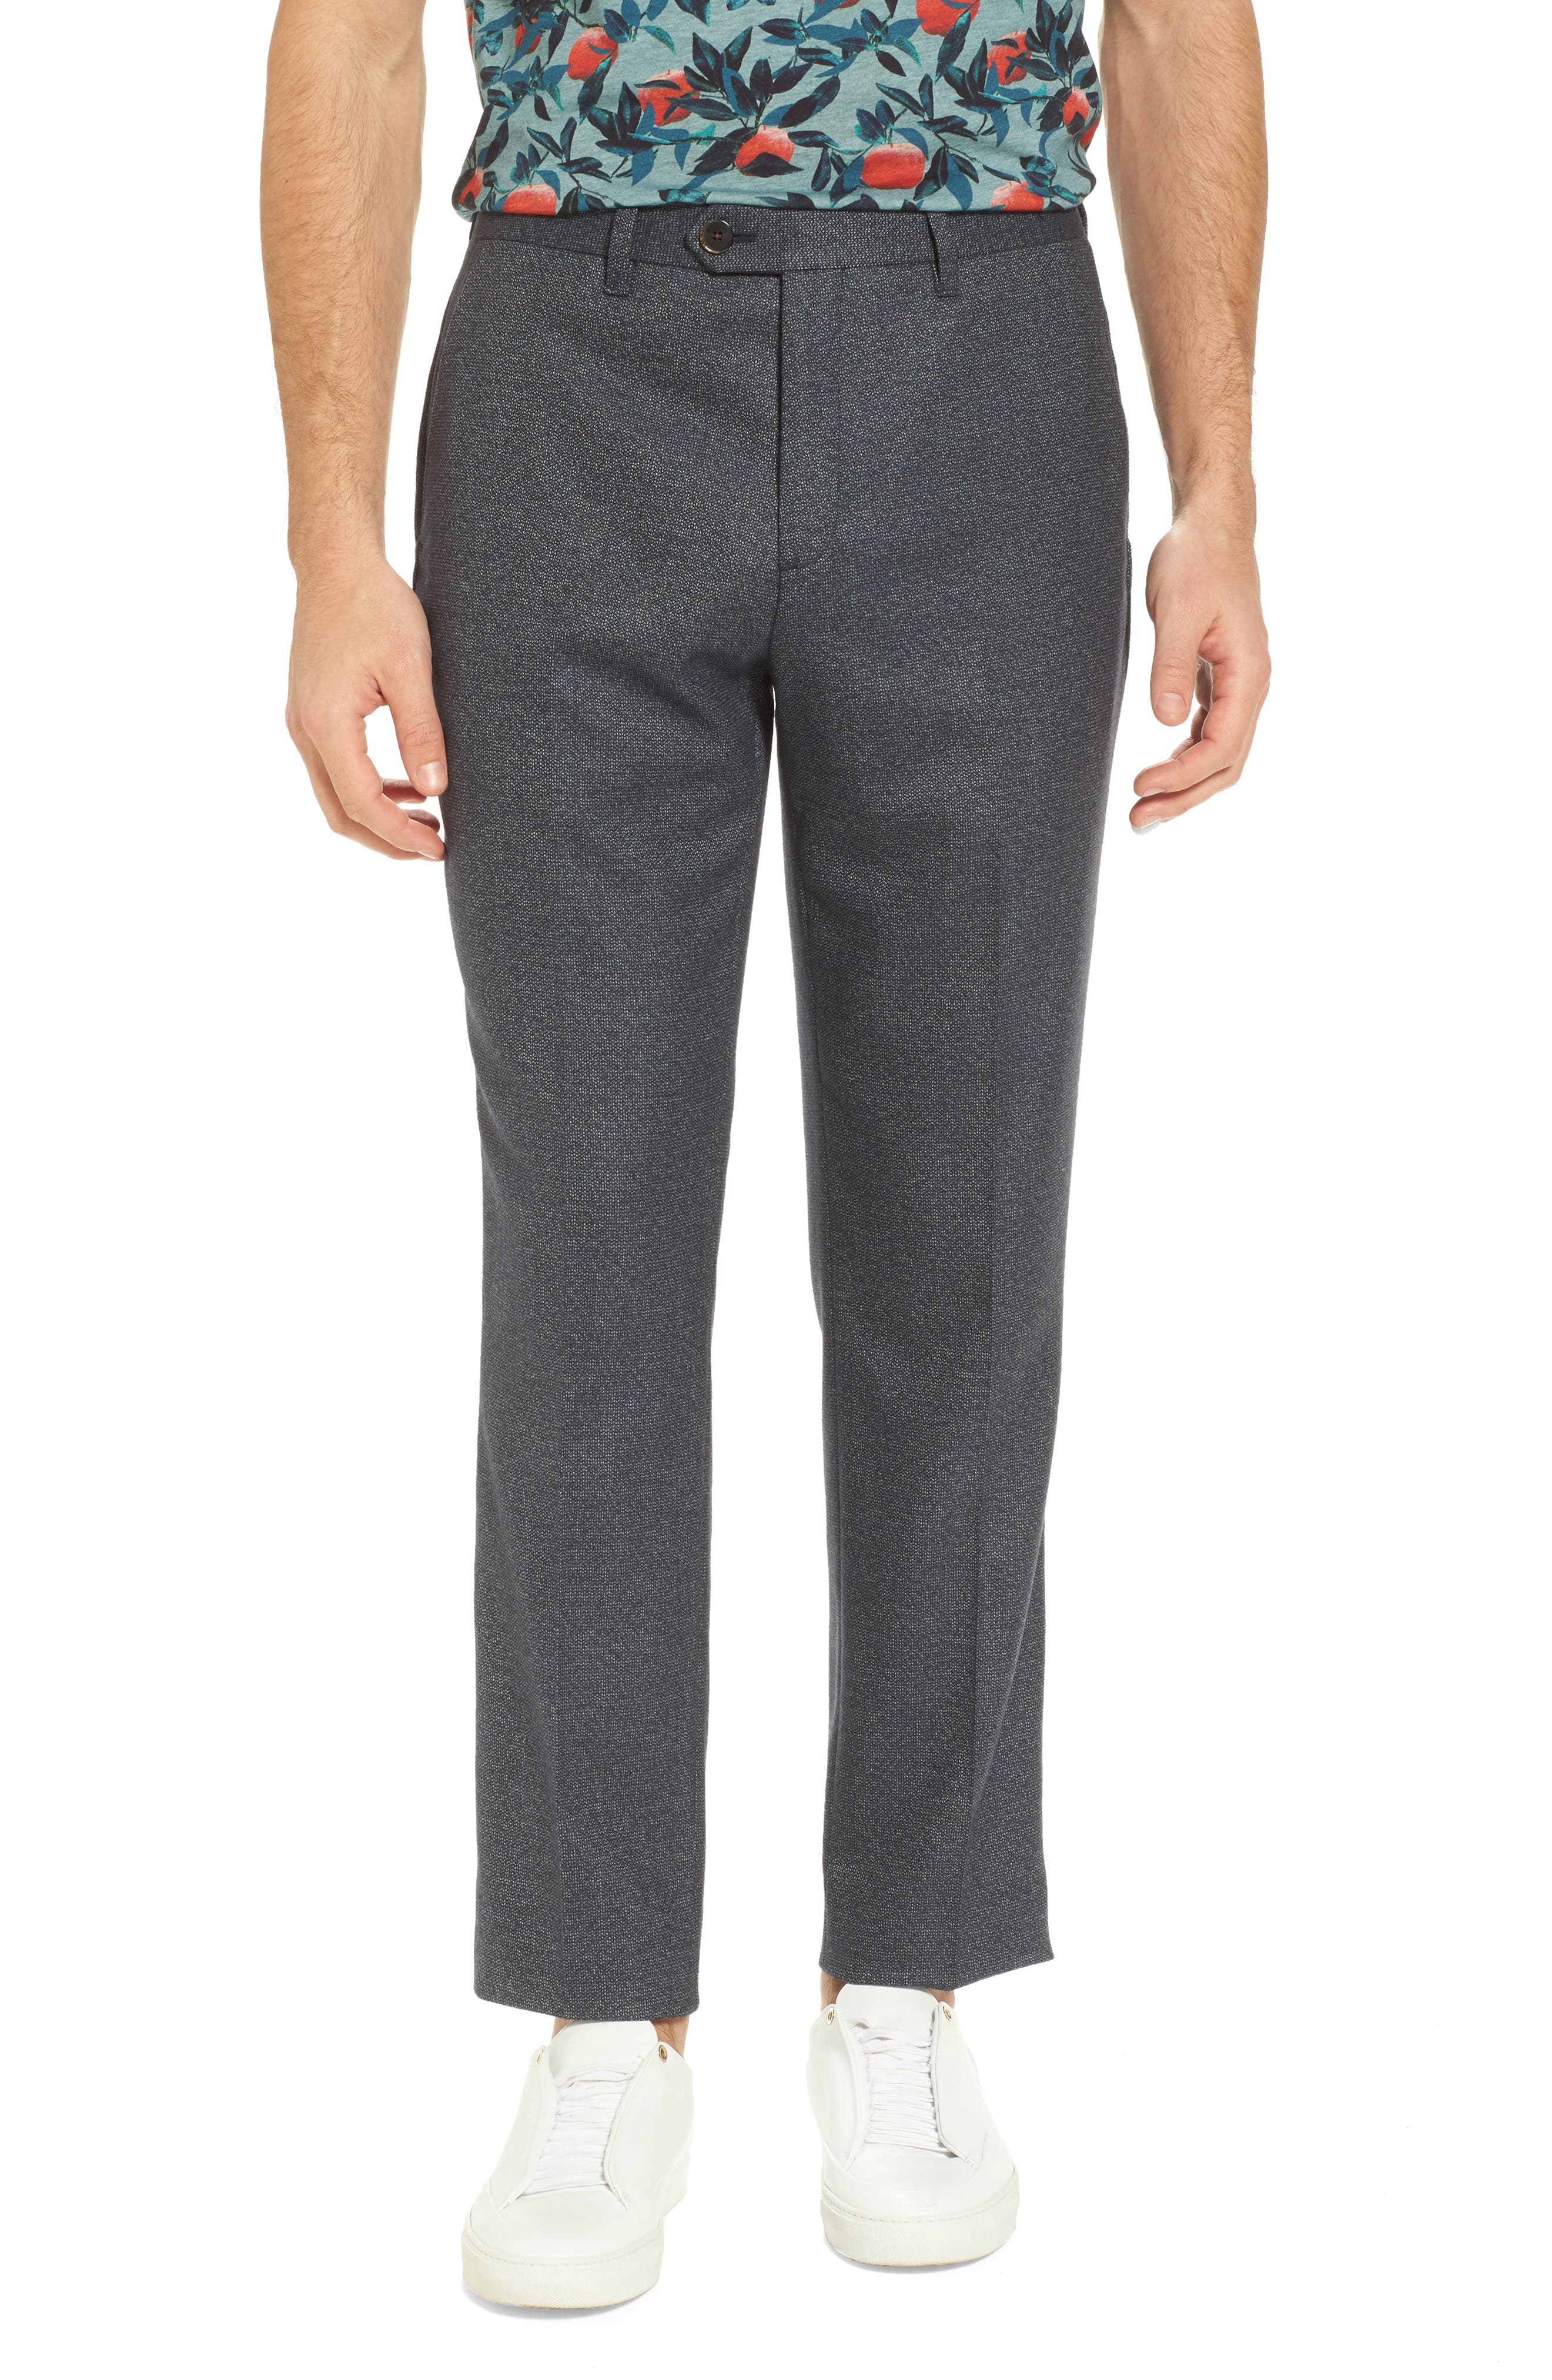 Beektro Trim Fit Trousers,                         Main,                         color,